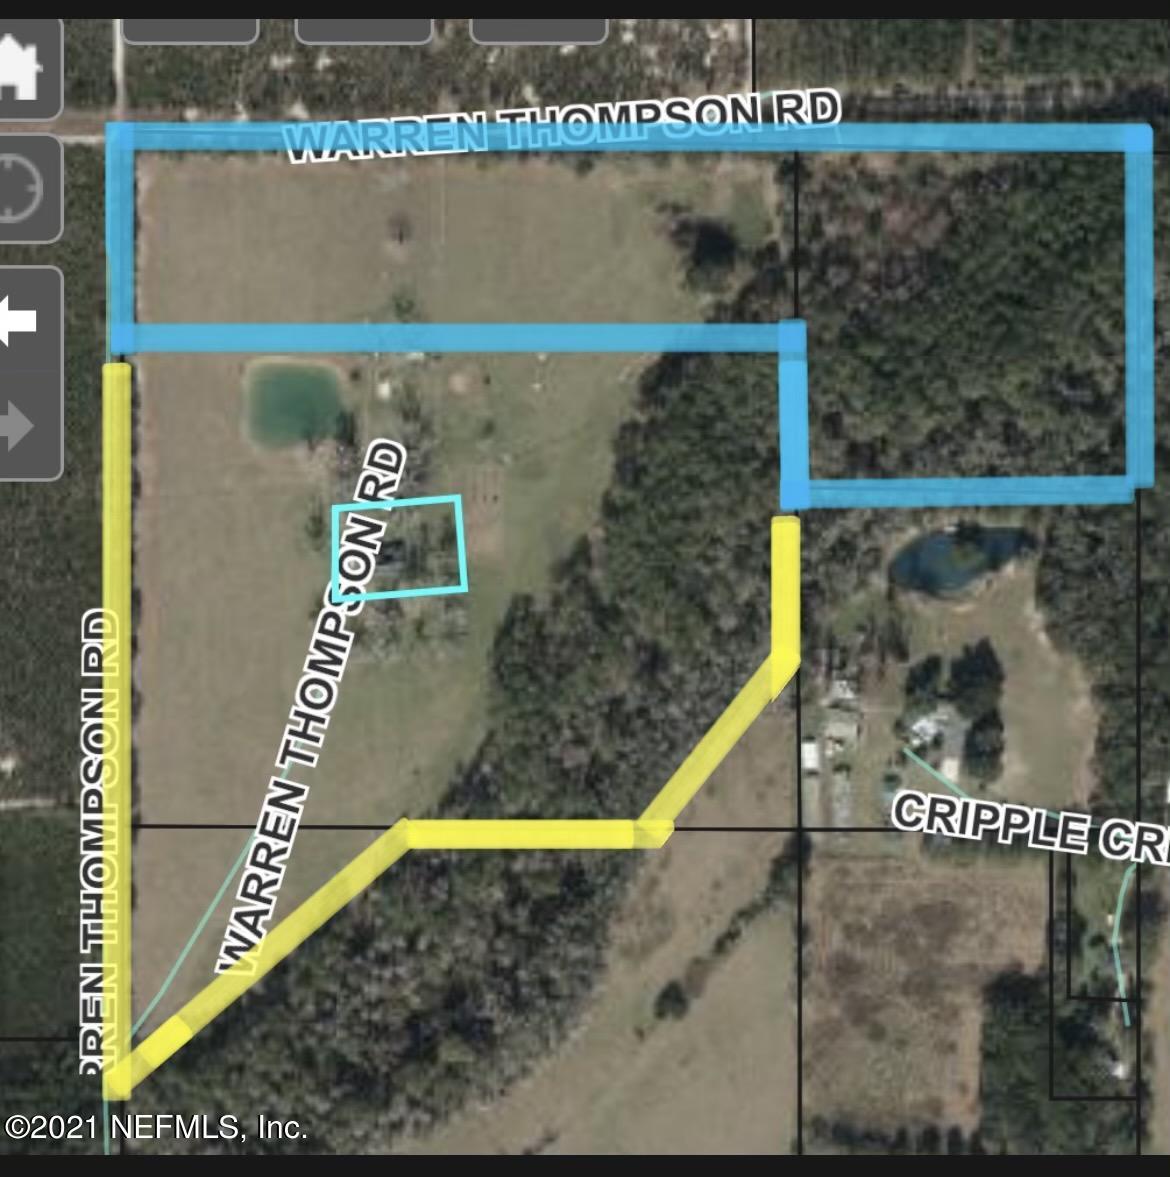 Image 73 For 11135 Warren Thompson Rd